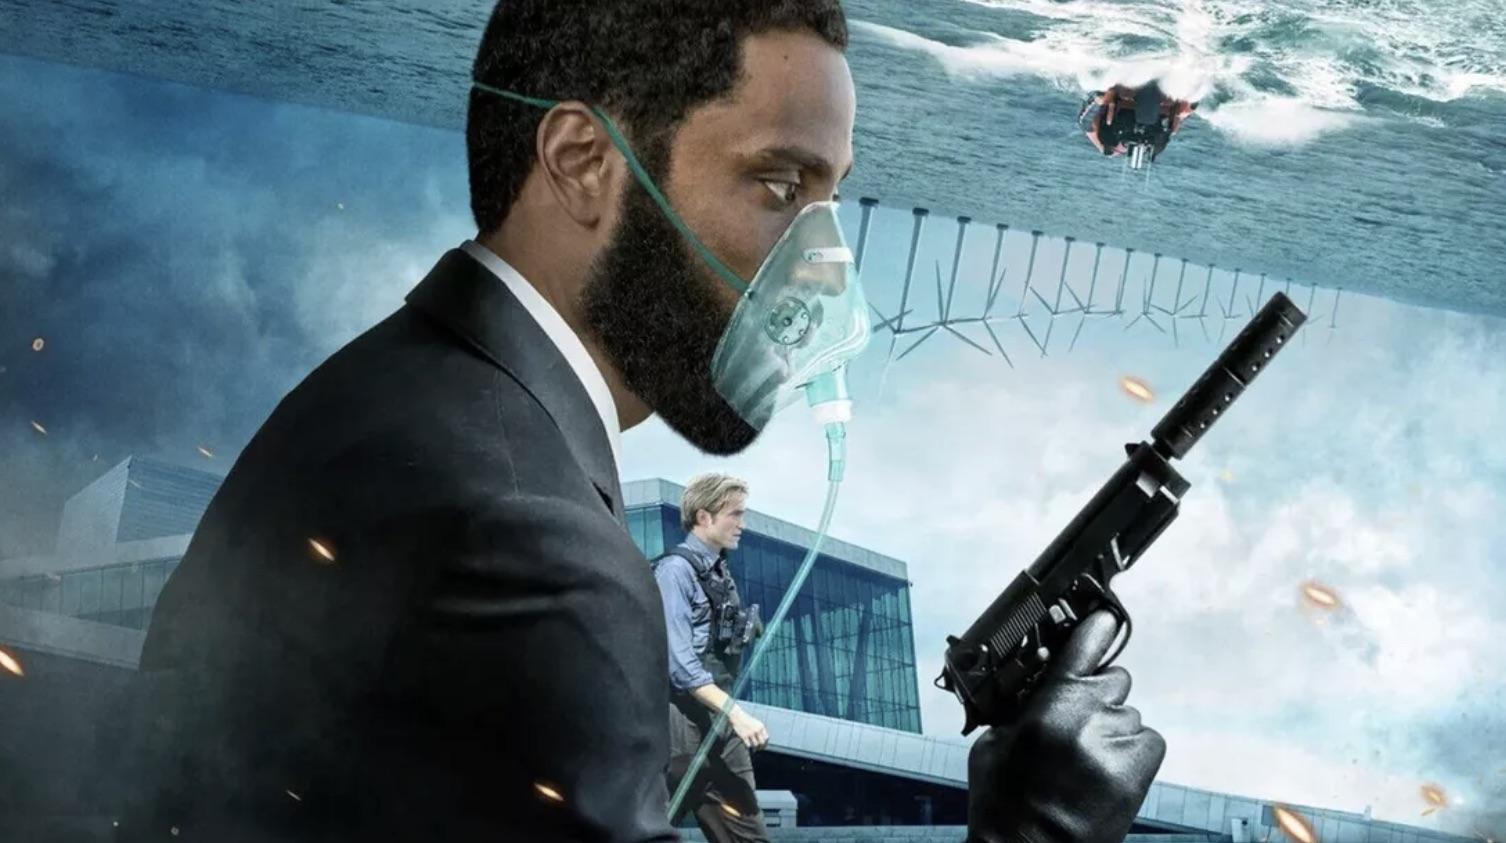 El cinematógrafo de Leo: Tenet (2020)